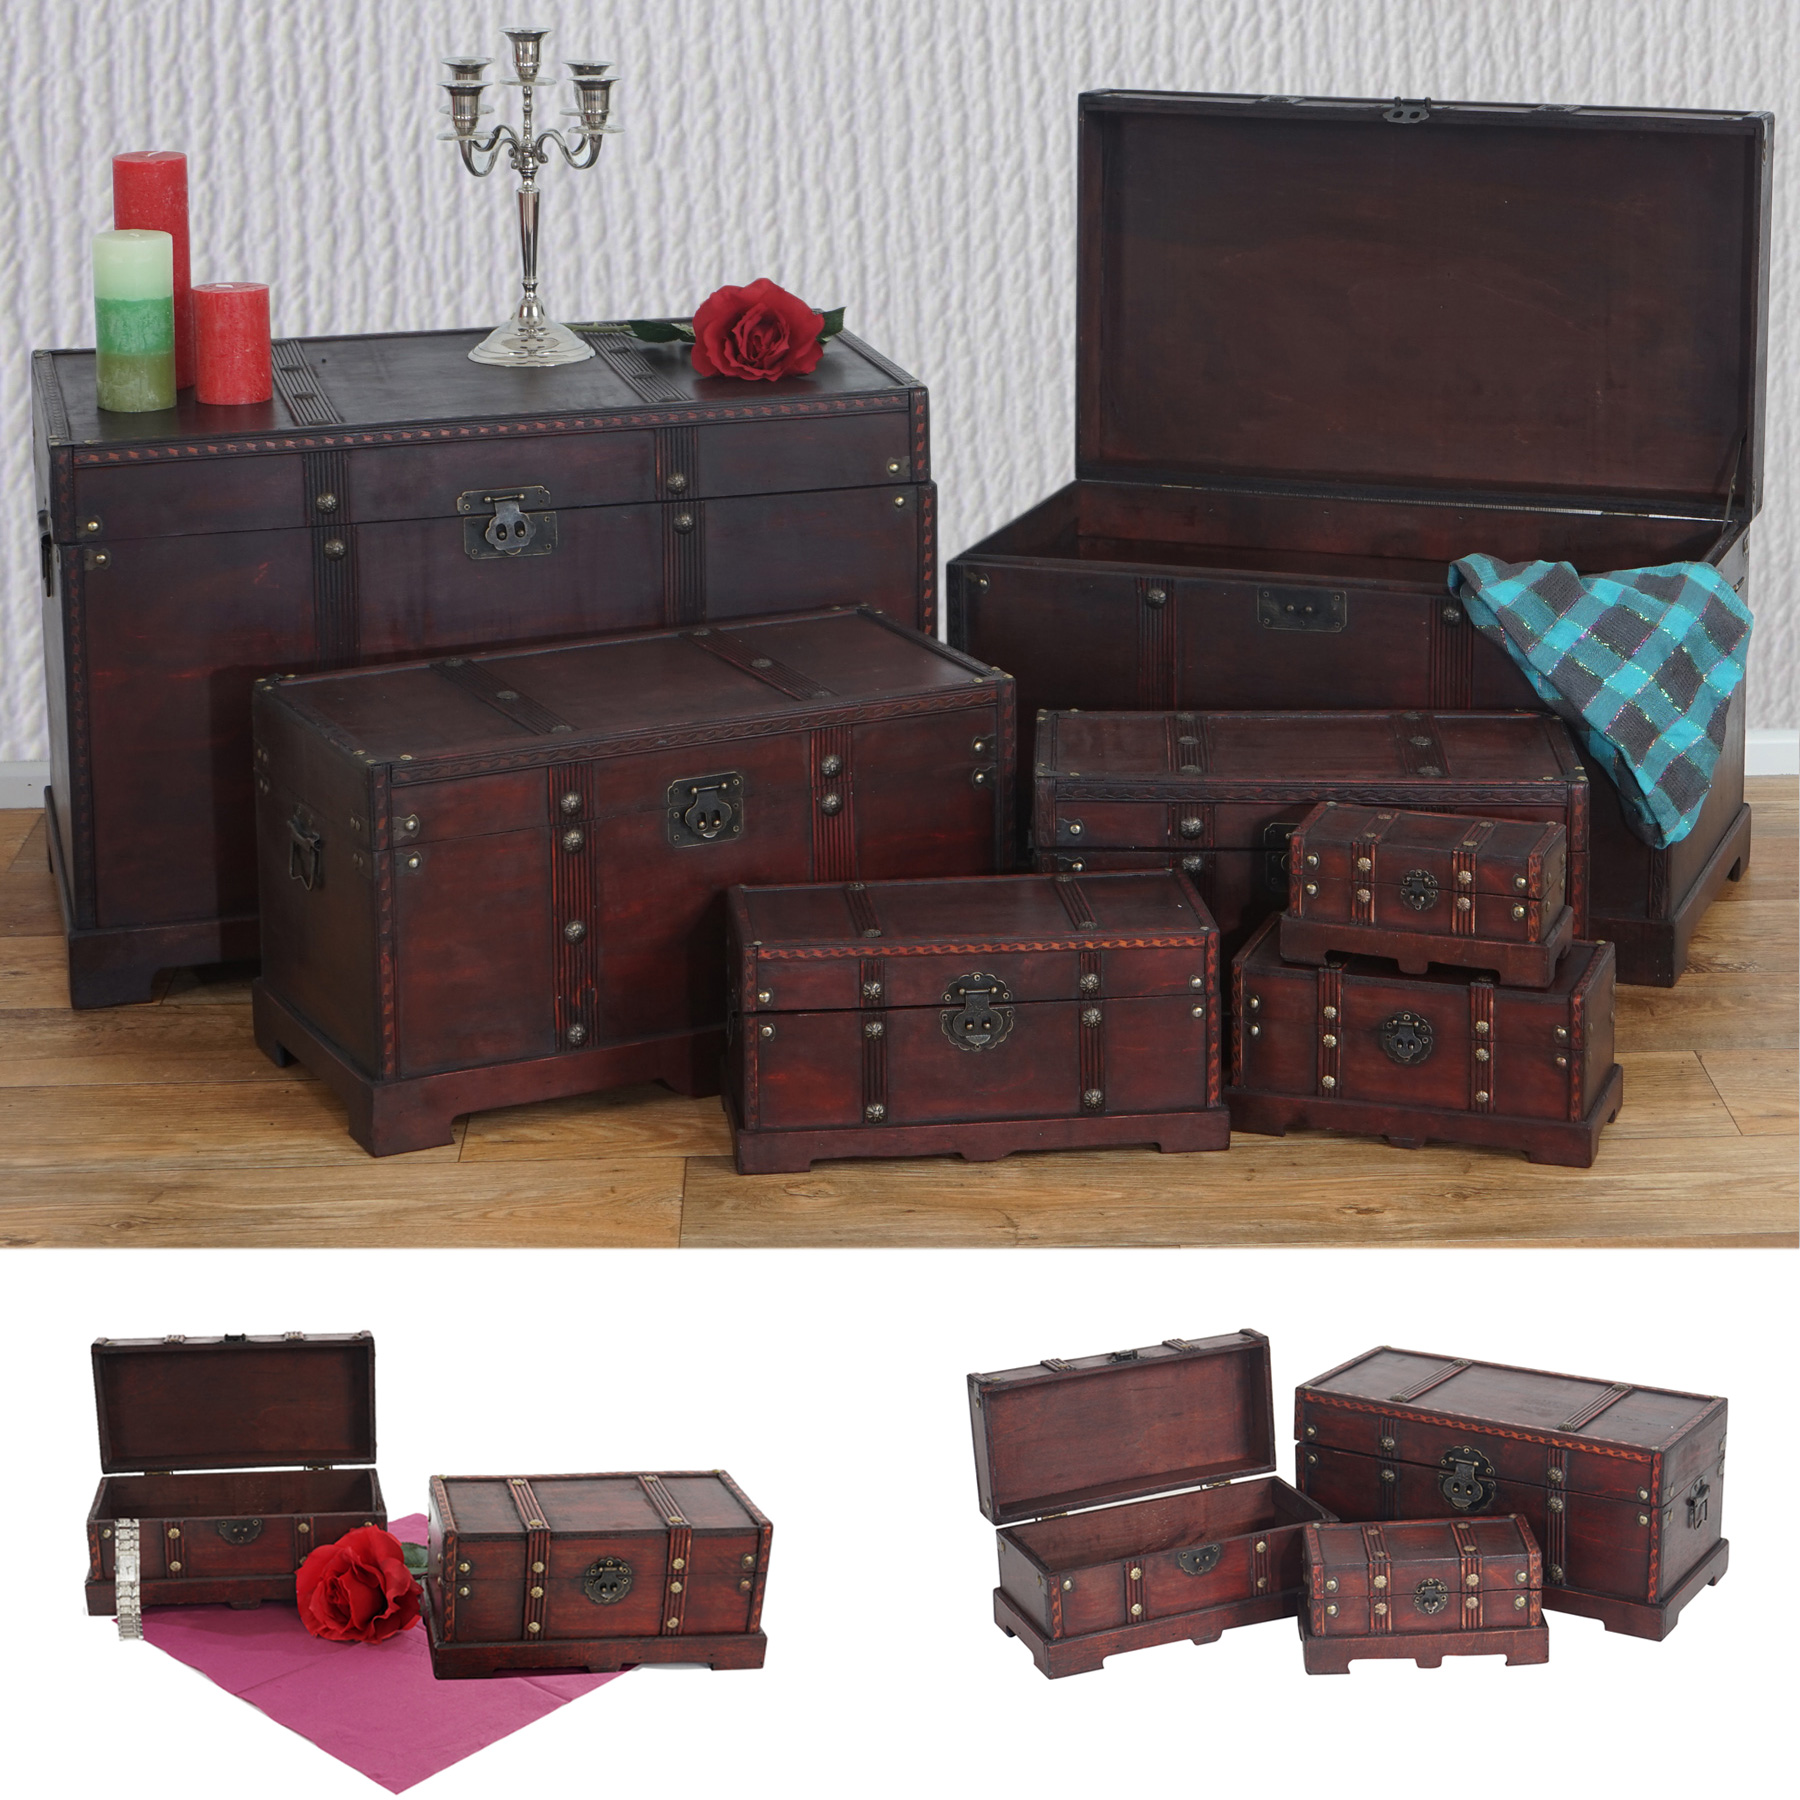 Mendler 7er Set Holztruhe Holzbox Schatztruhe Valence Antikoptik 10x21x10 bis 49x77x47cm ~ Variantenangebot 35896